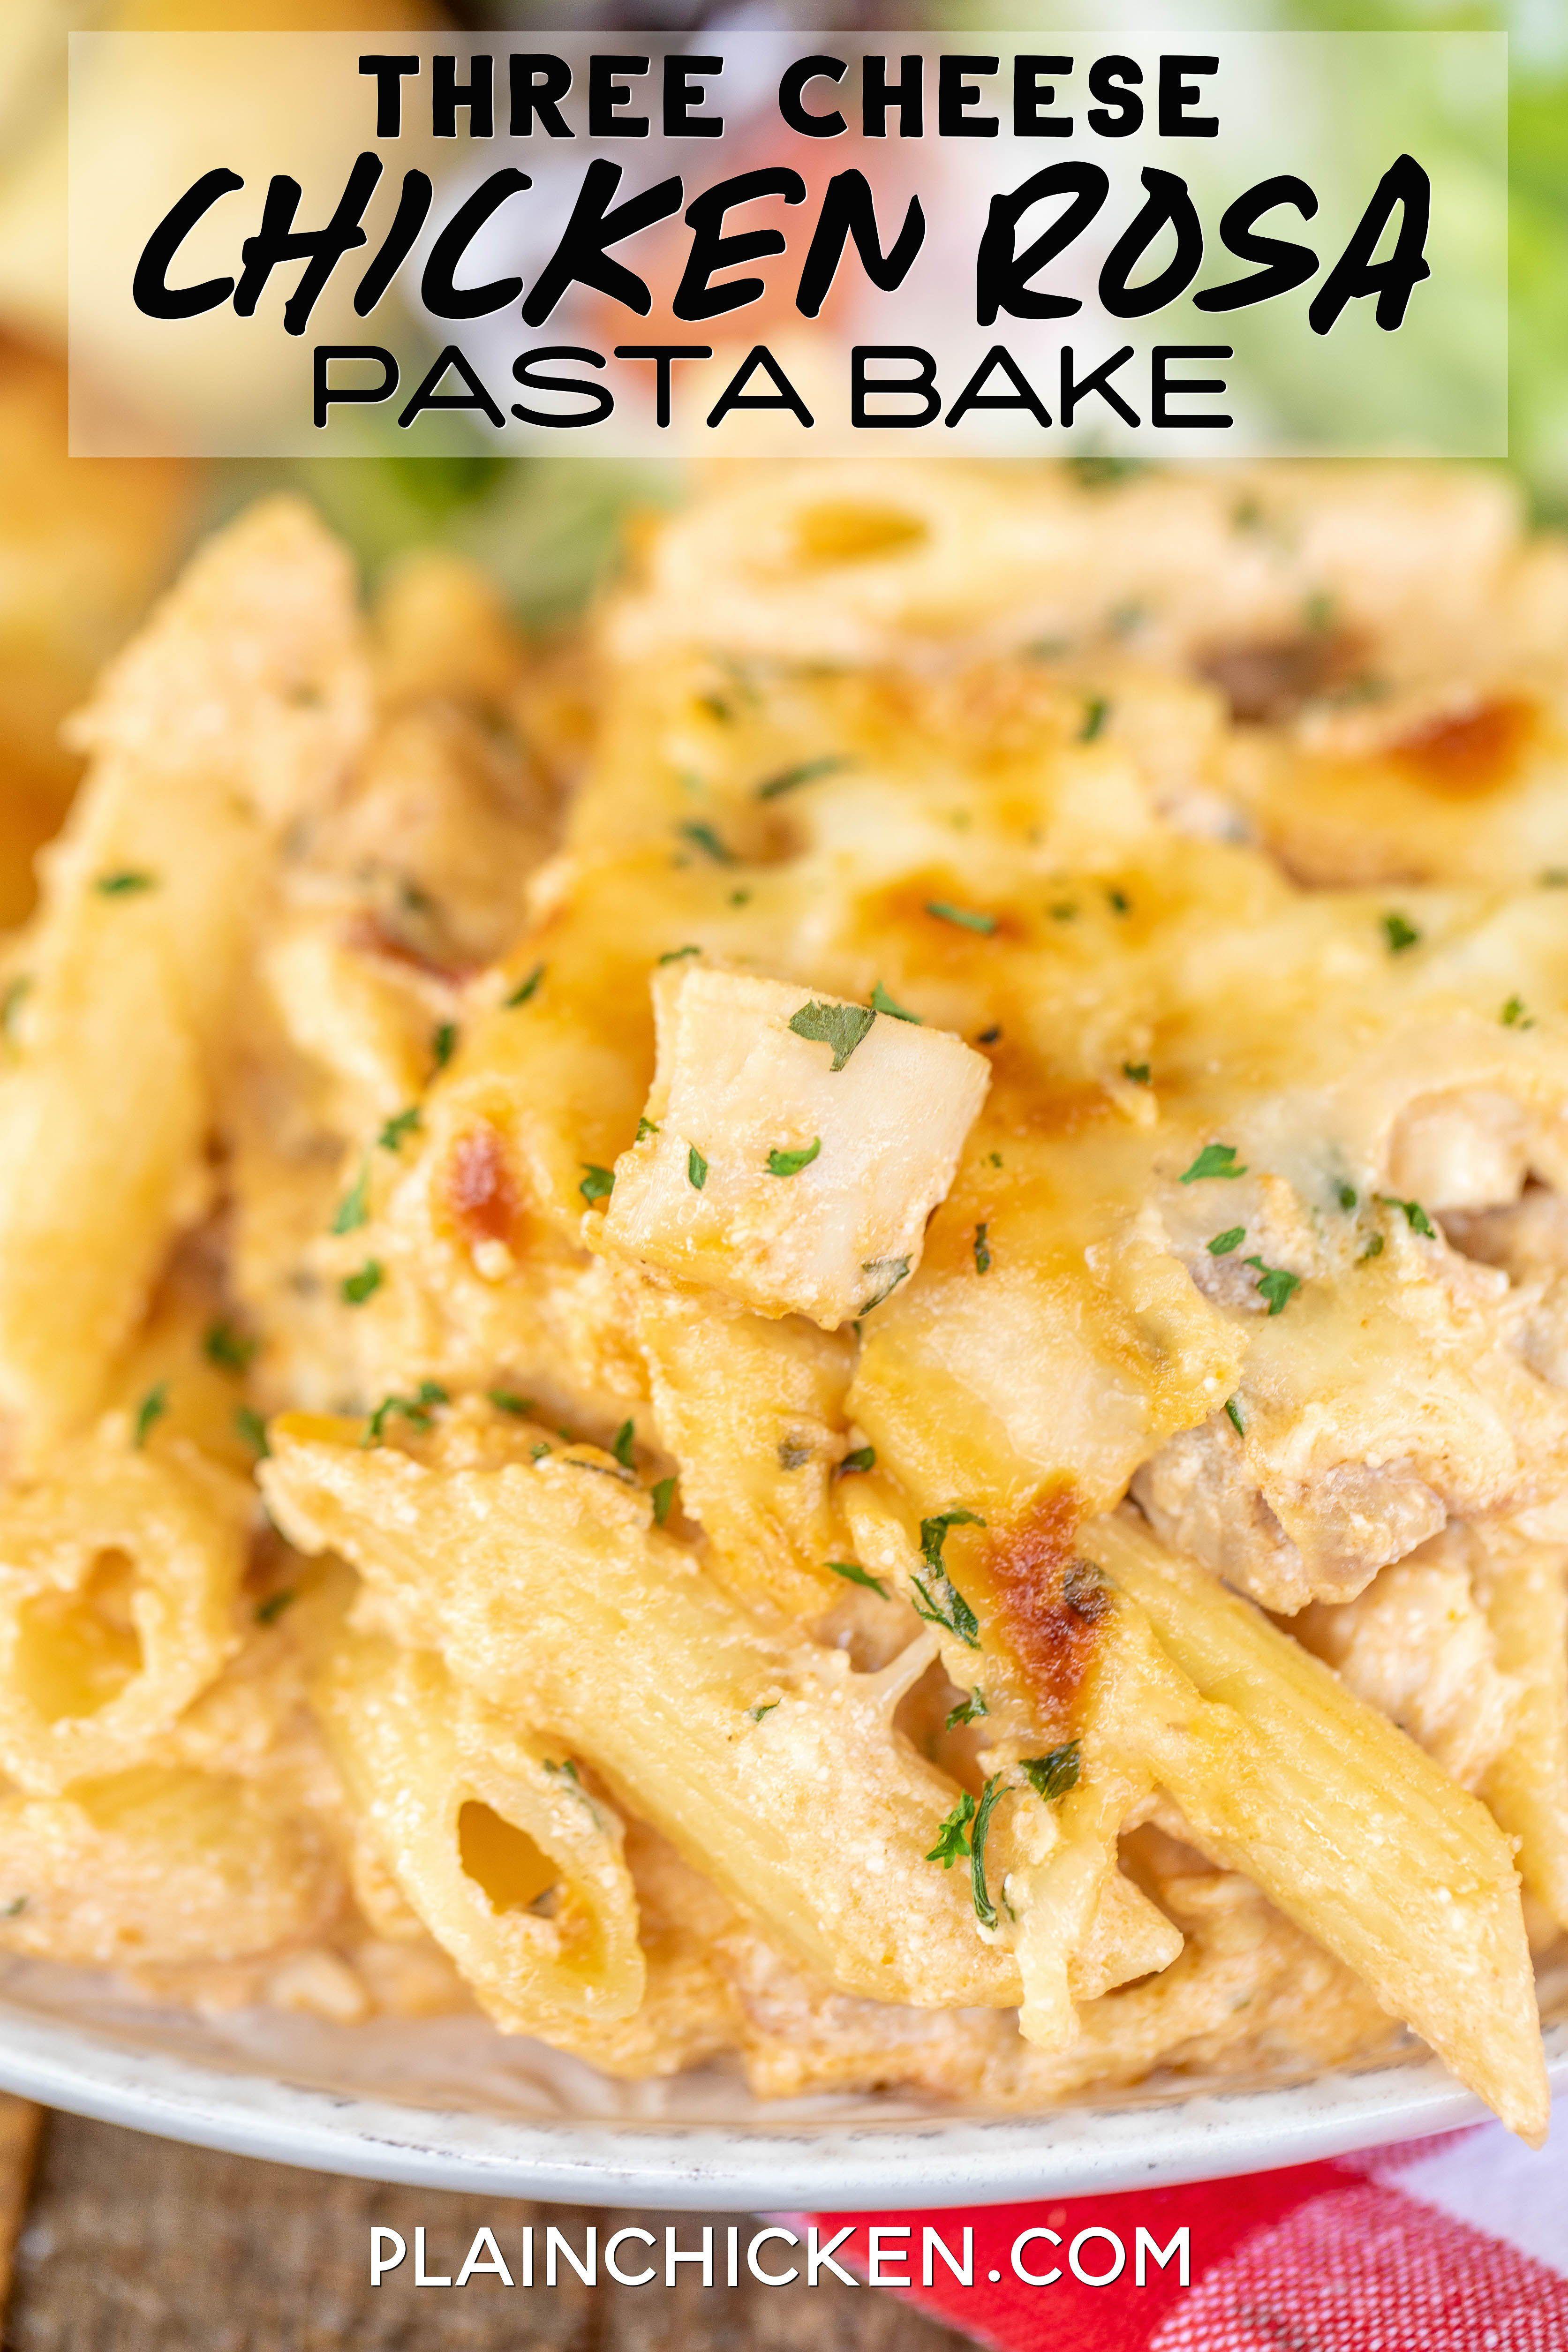 Three Cheese Chicken Rosa Pasta Bake Hotdish Recipes Pasta Dishes Pasta Bake Easy